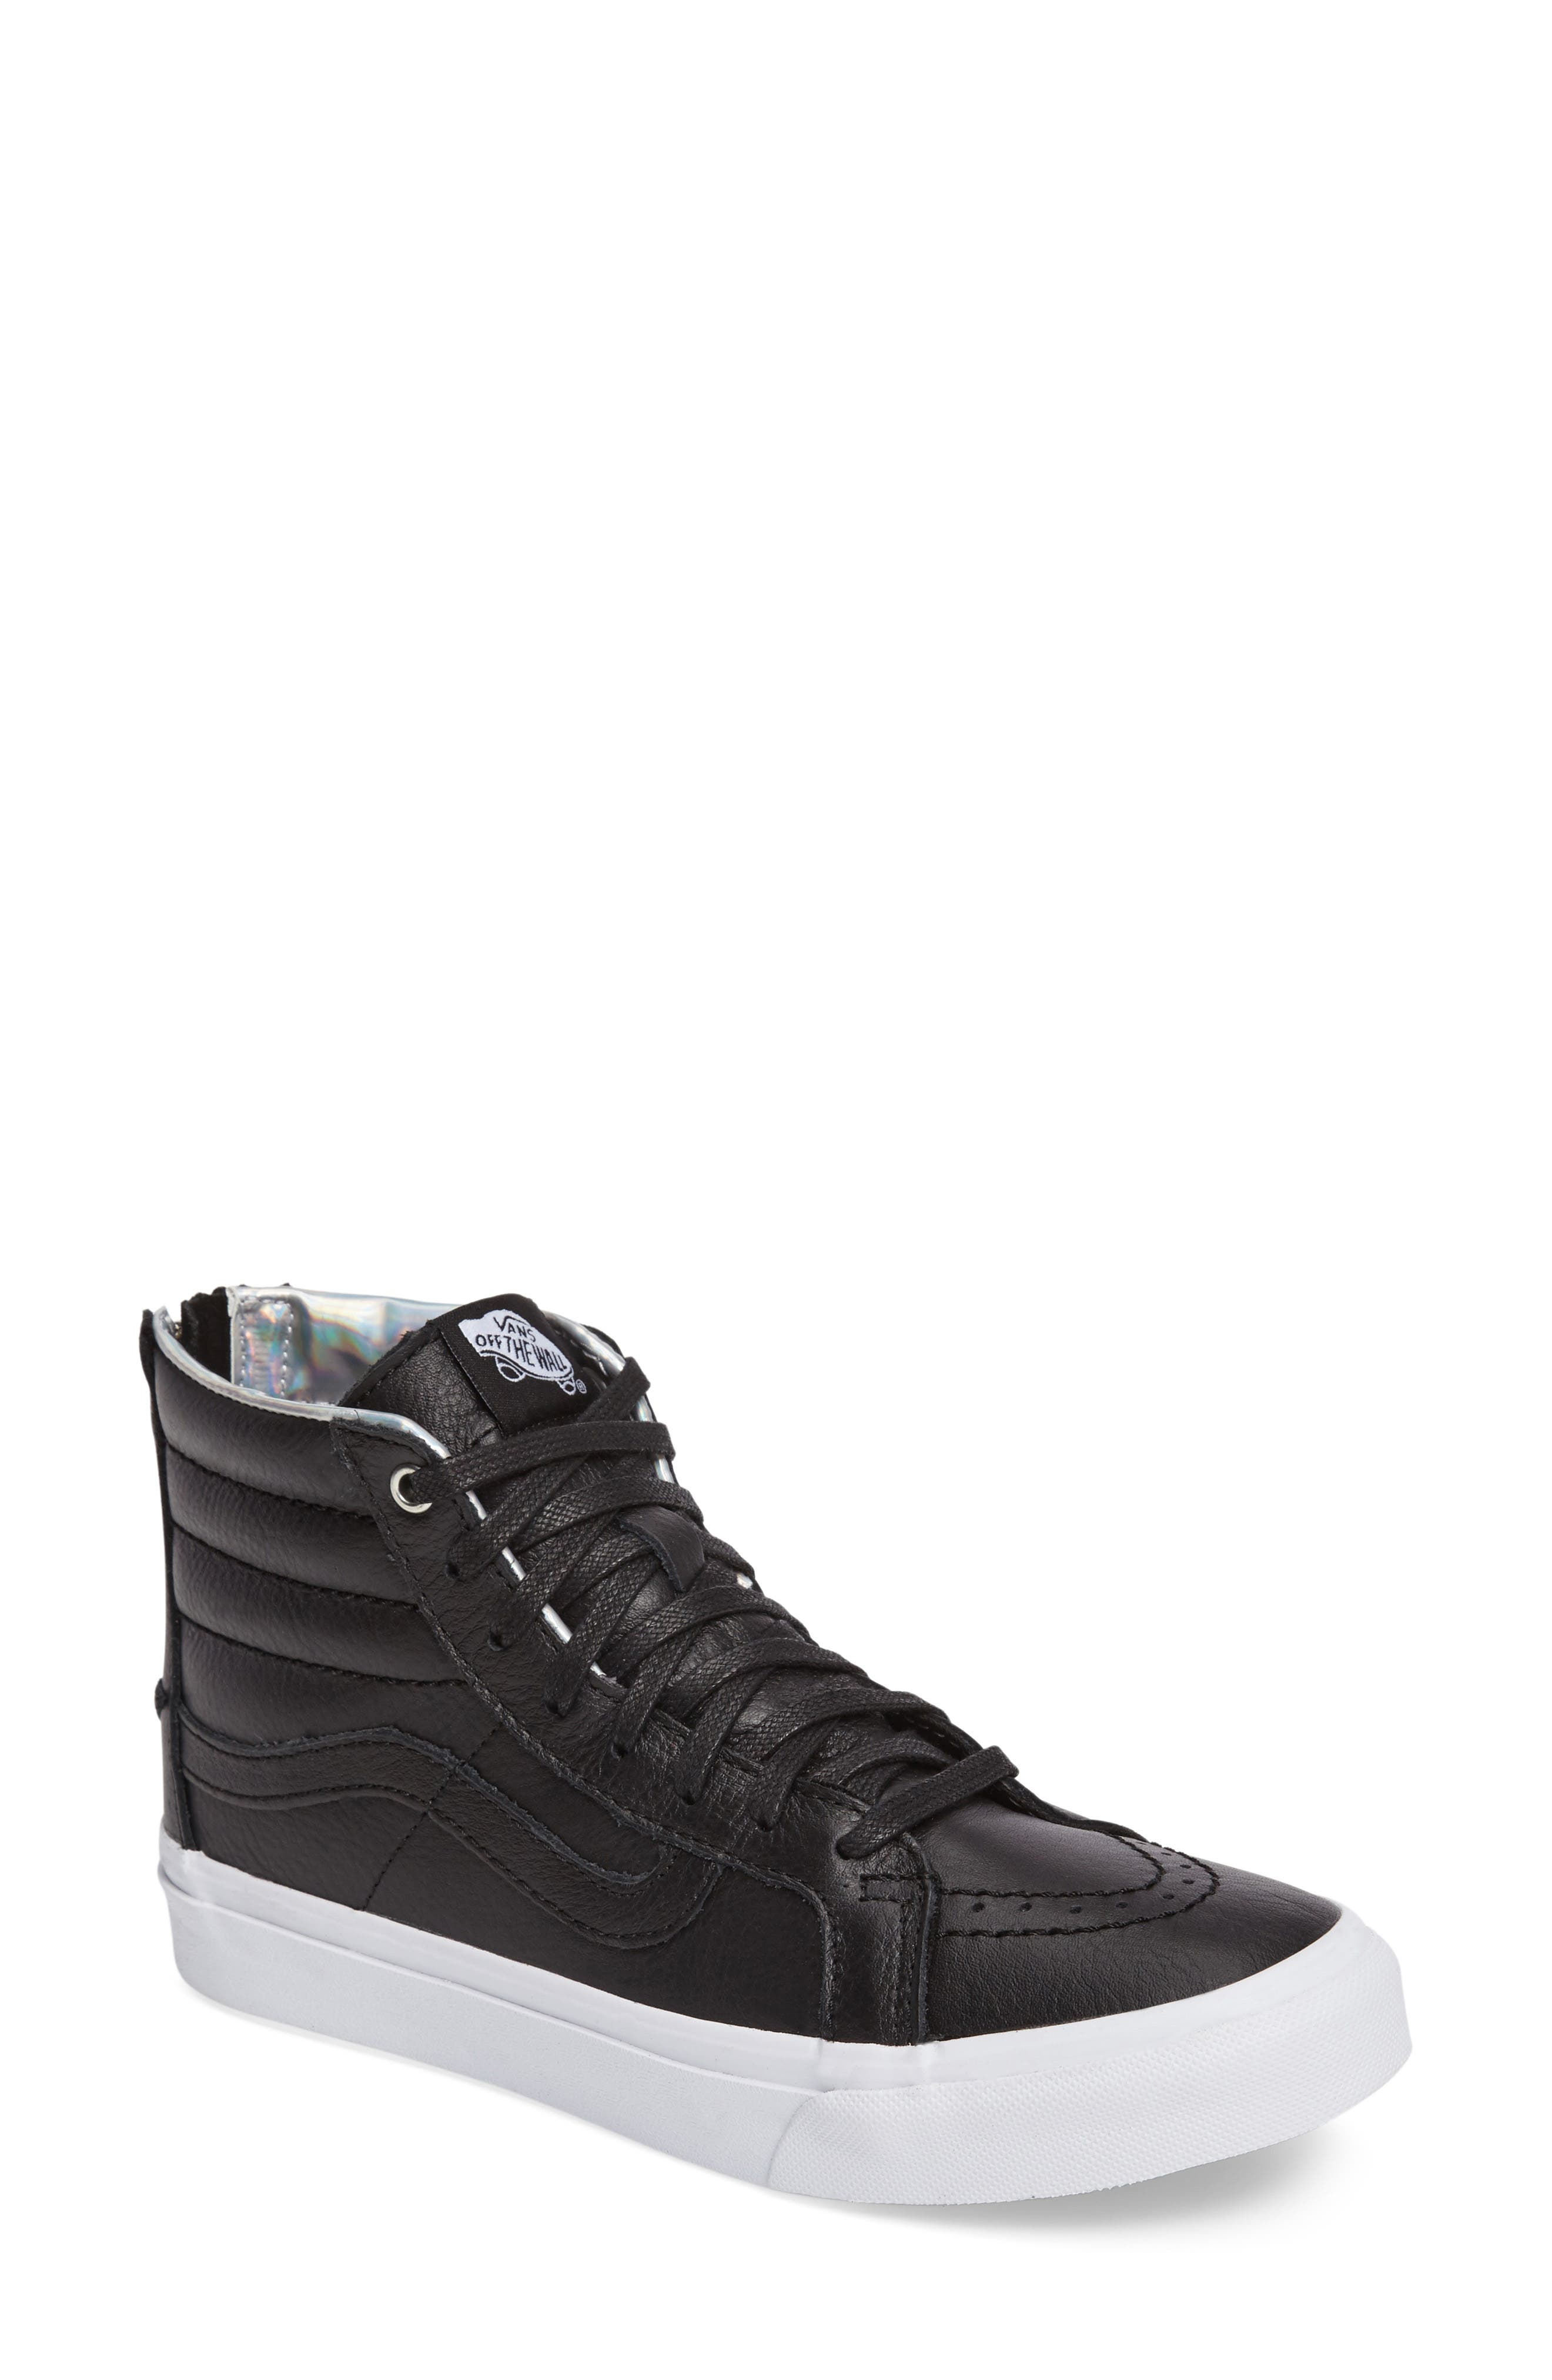 Main Image - Vans 'Sk8-Hi Slim' Metallic Leather Sneaker (Women)